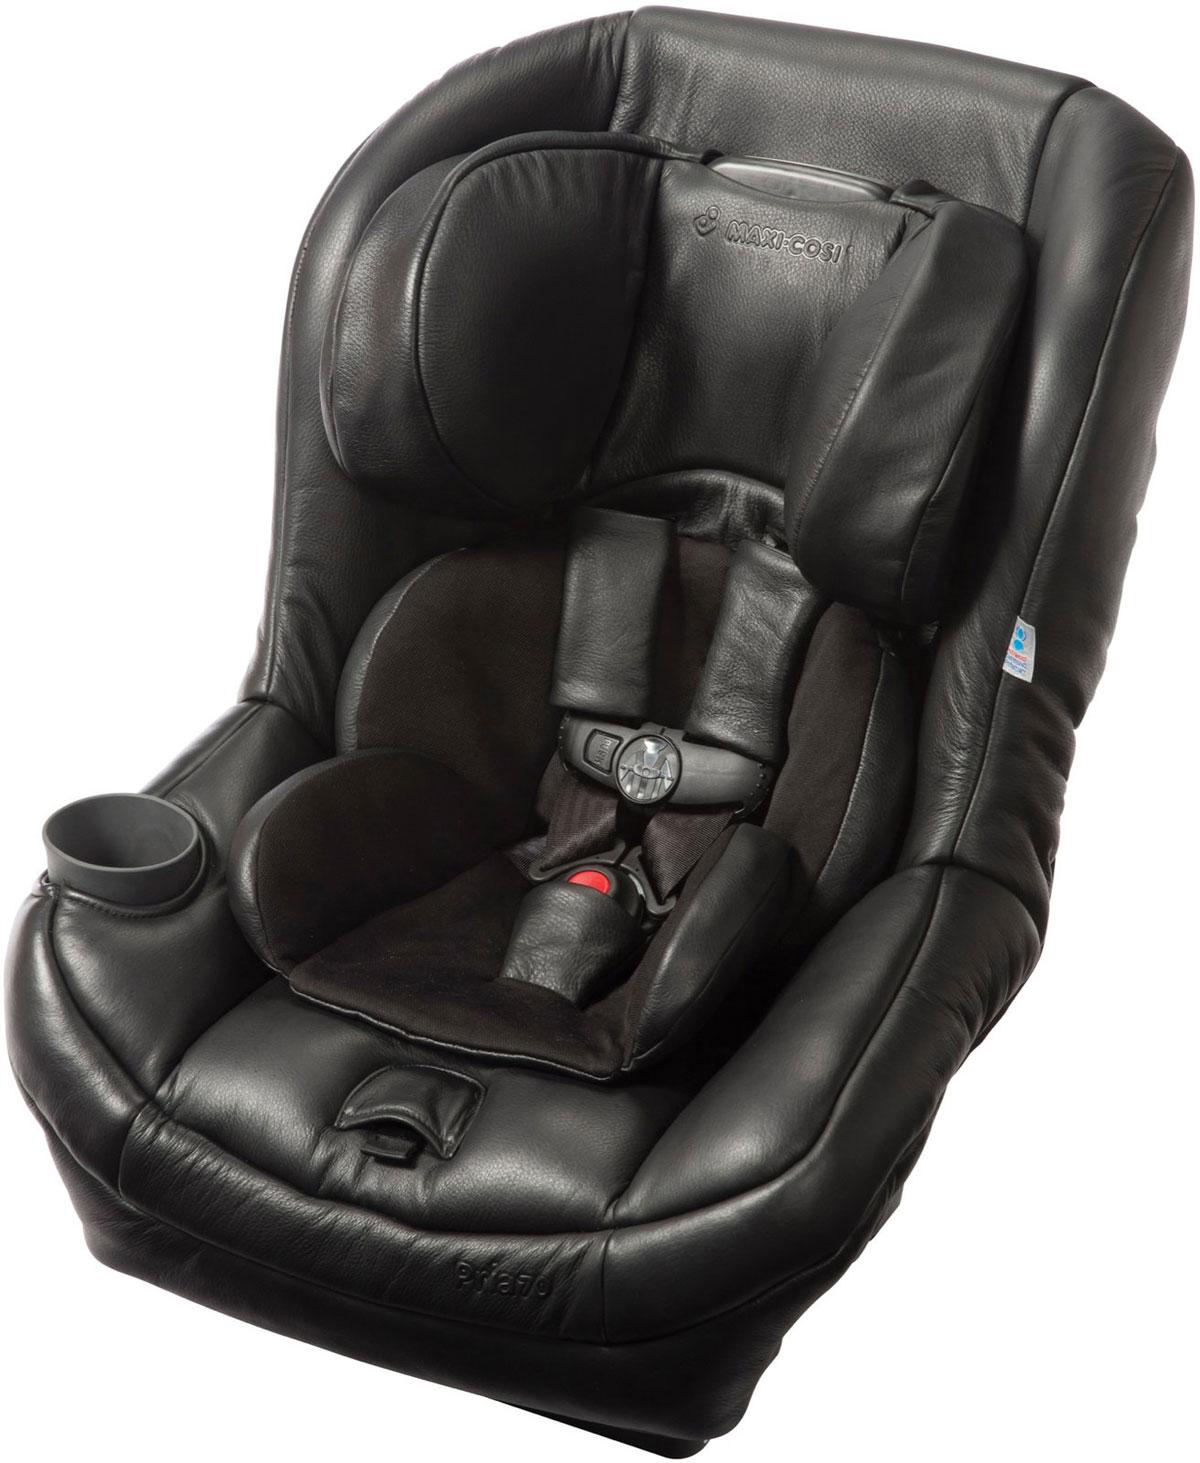 Maxi-Cosi Limited Edition Pria 70 Leather Car Seat